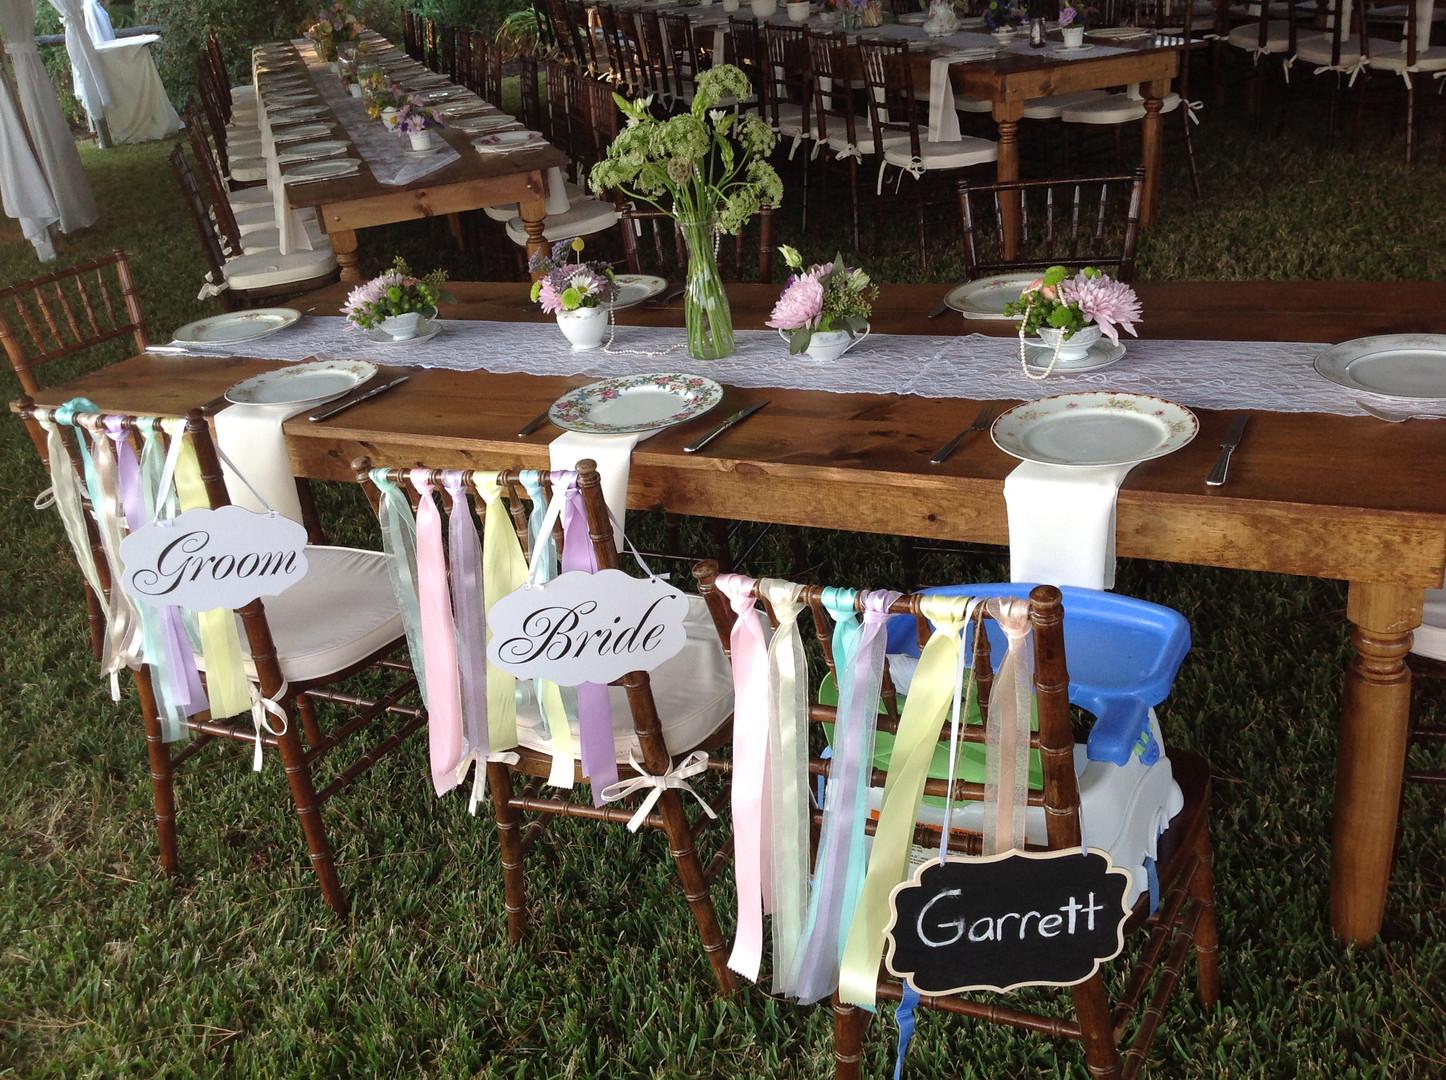 Carpenter Ward Wedding 10-11-13 519 (34).JPG